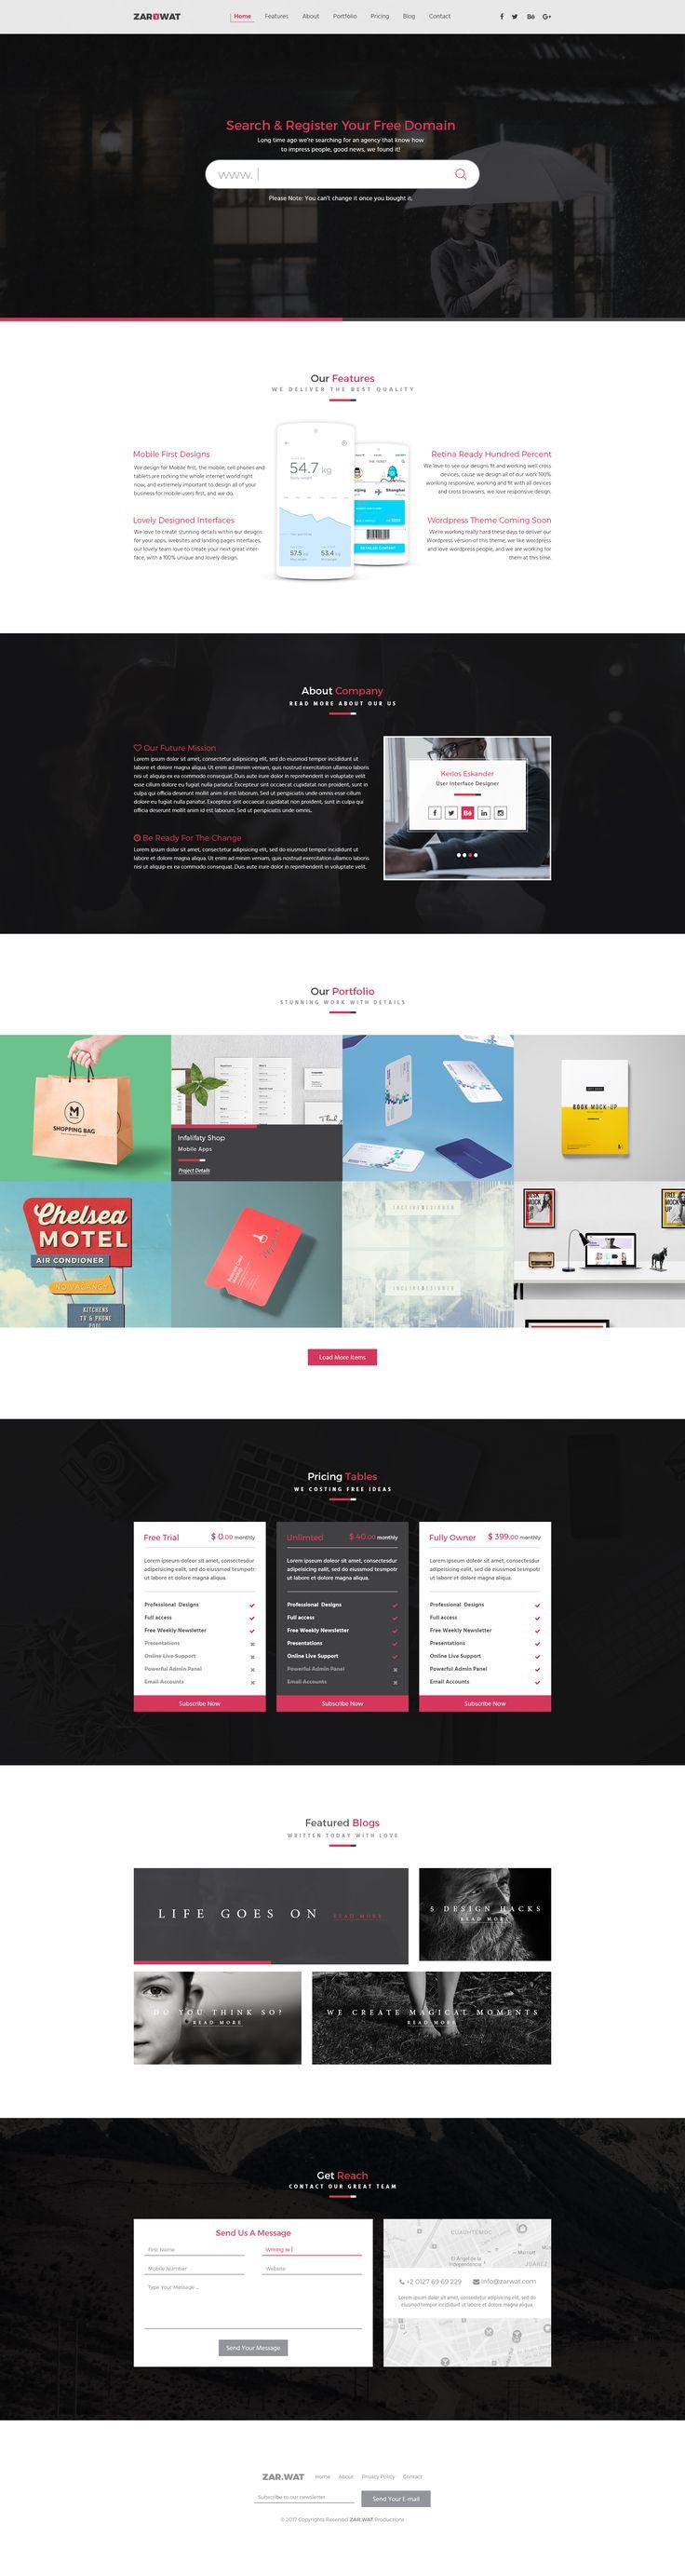 Zarwat Creative One Page PSD Template by kerlos236 | ThemeForest